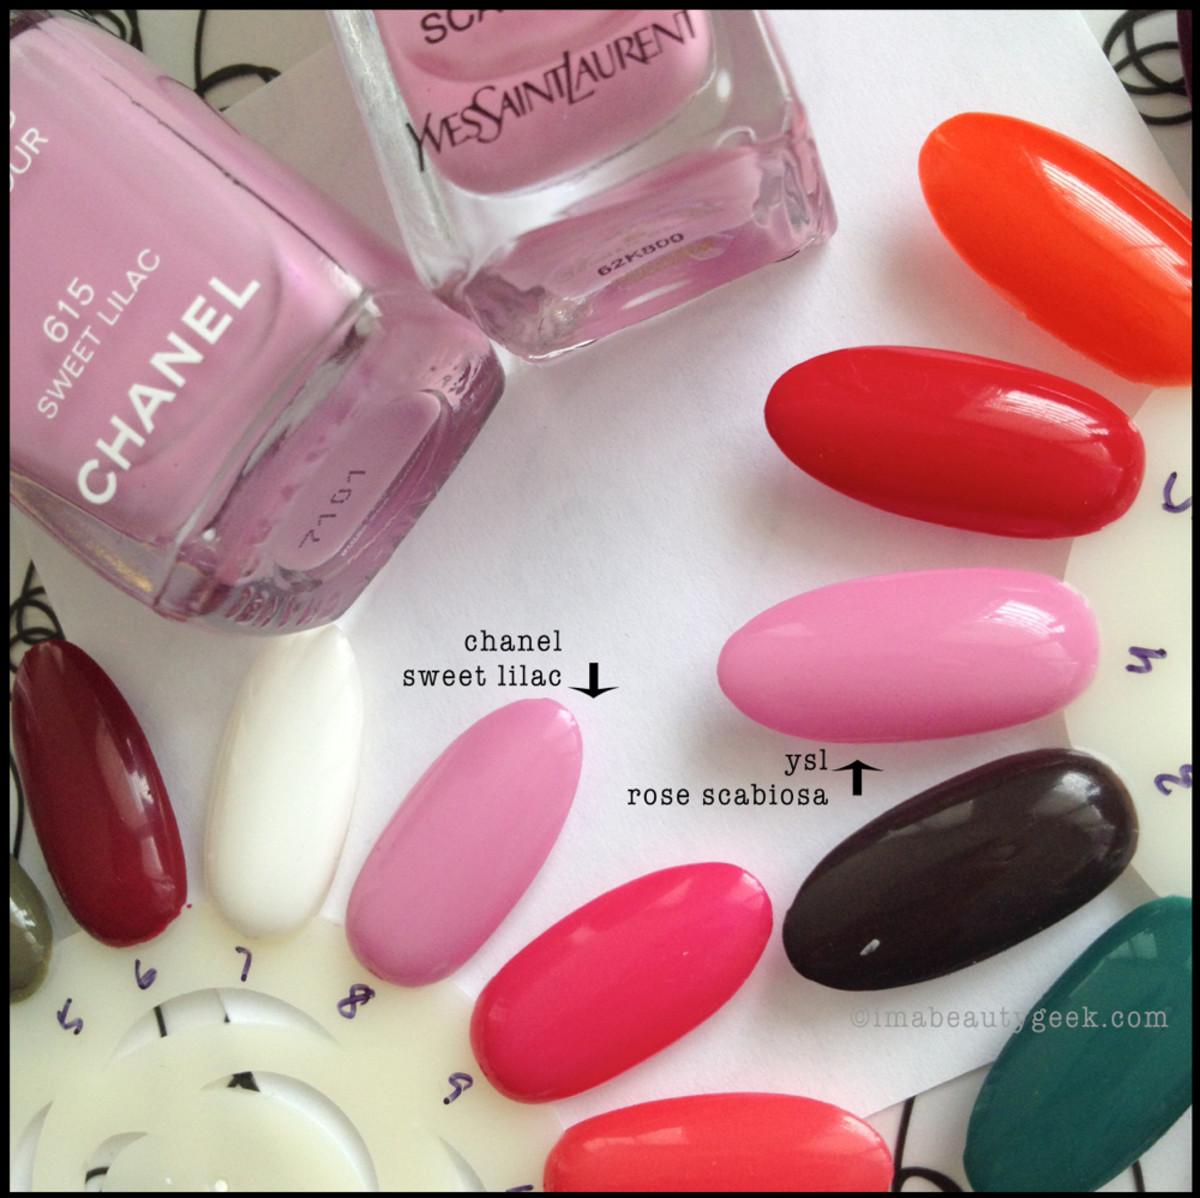 Chanel Sweet Lilac vs YSL Rose Scabiosa